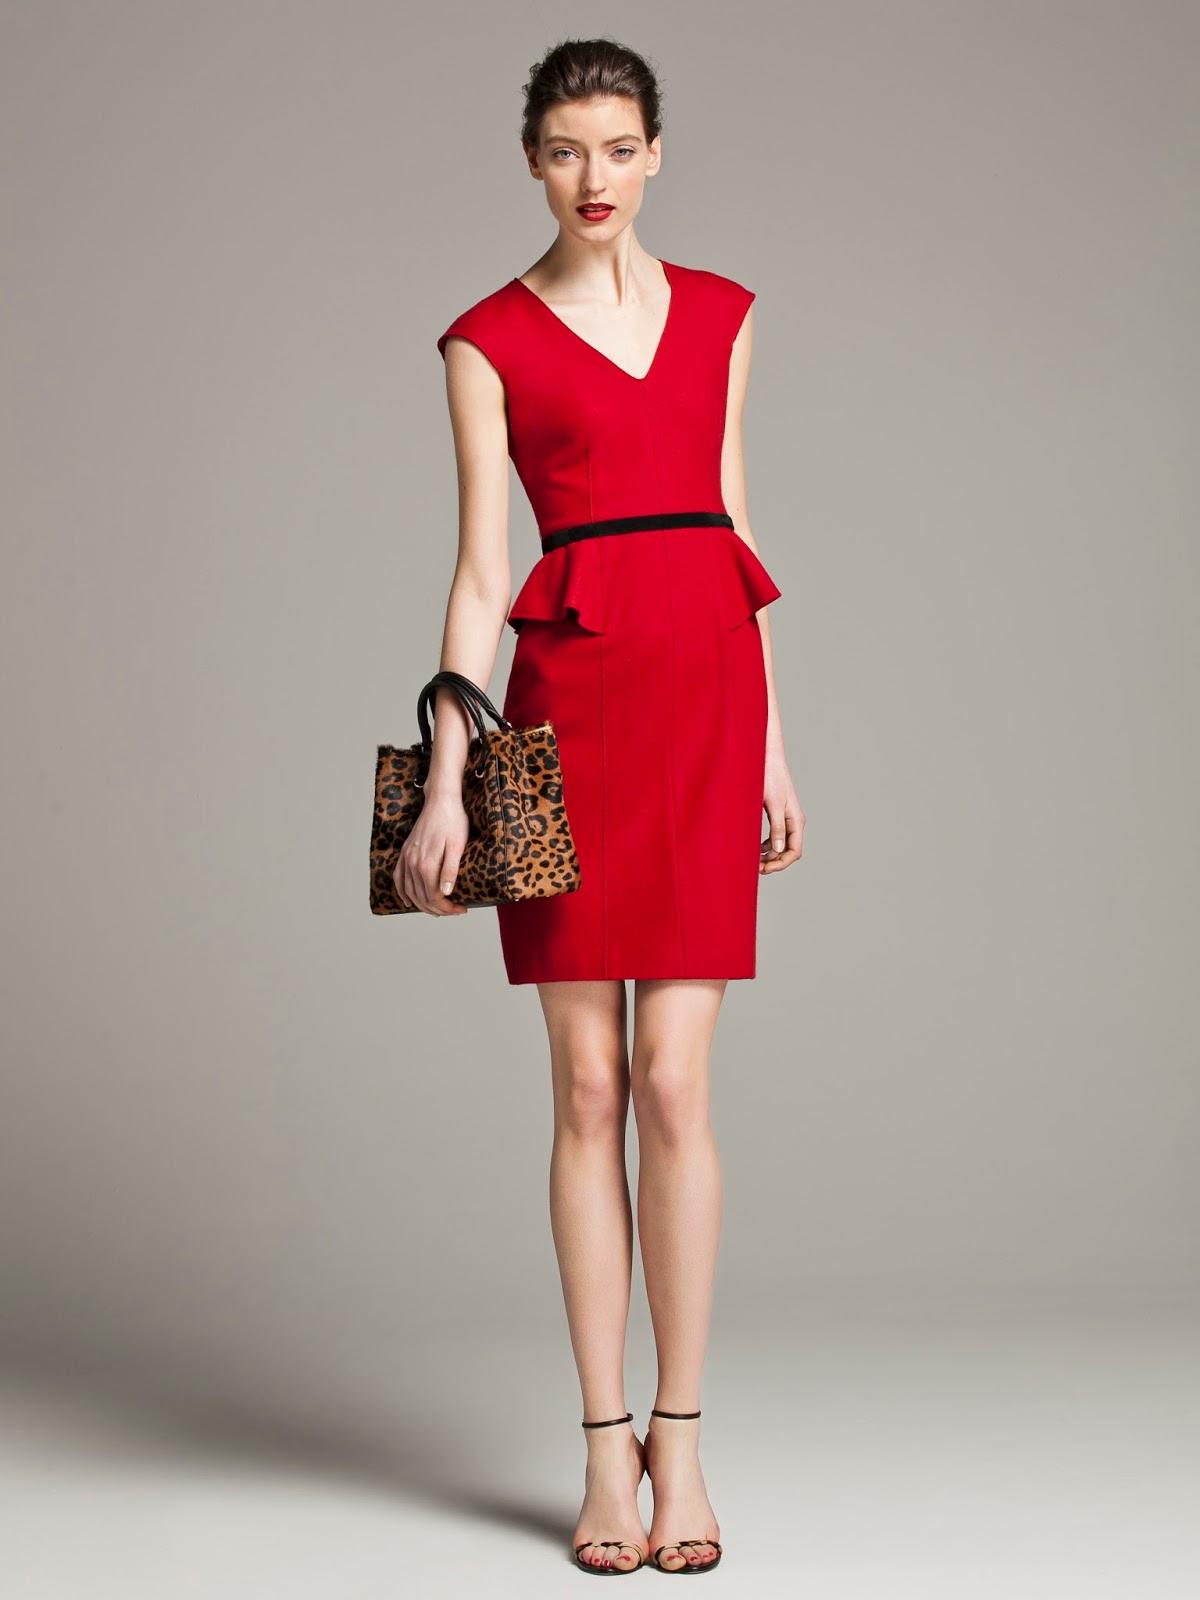 Fashion week verao 2017 - Lady In Red Carolina Herrera A Rapariga Do Vestido Amarelo